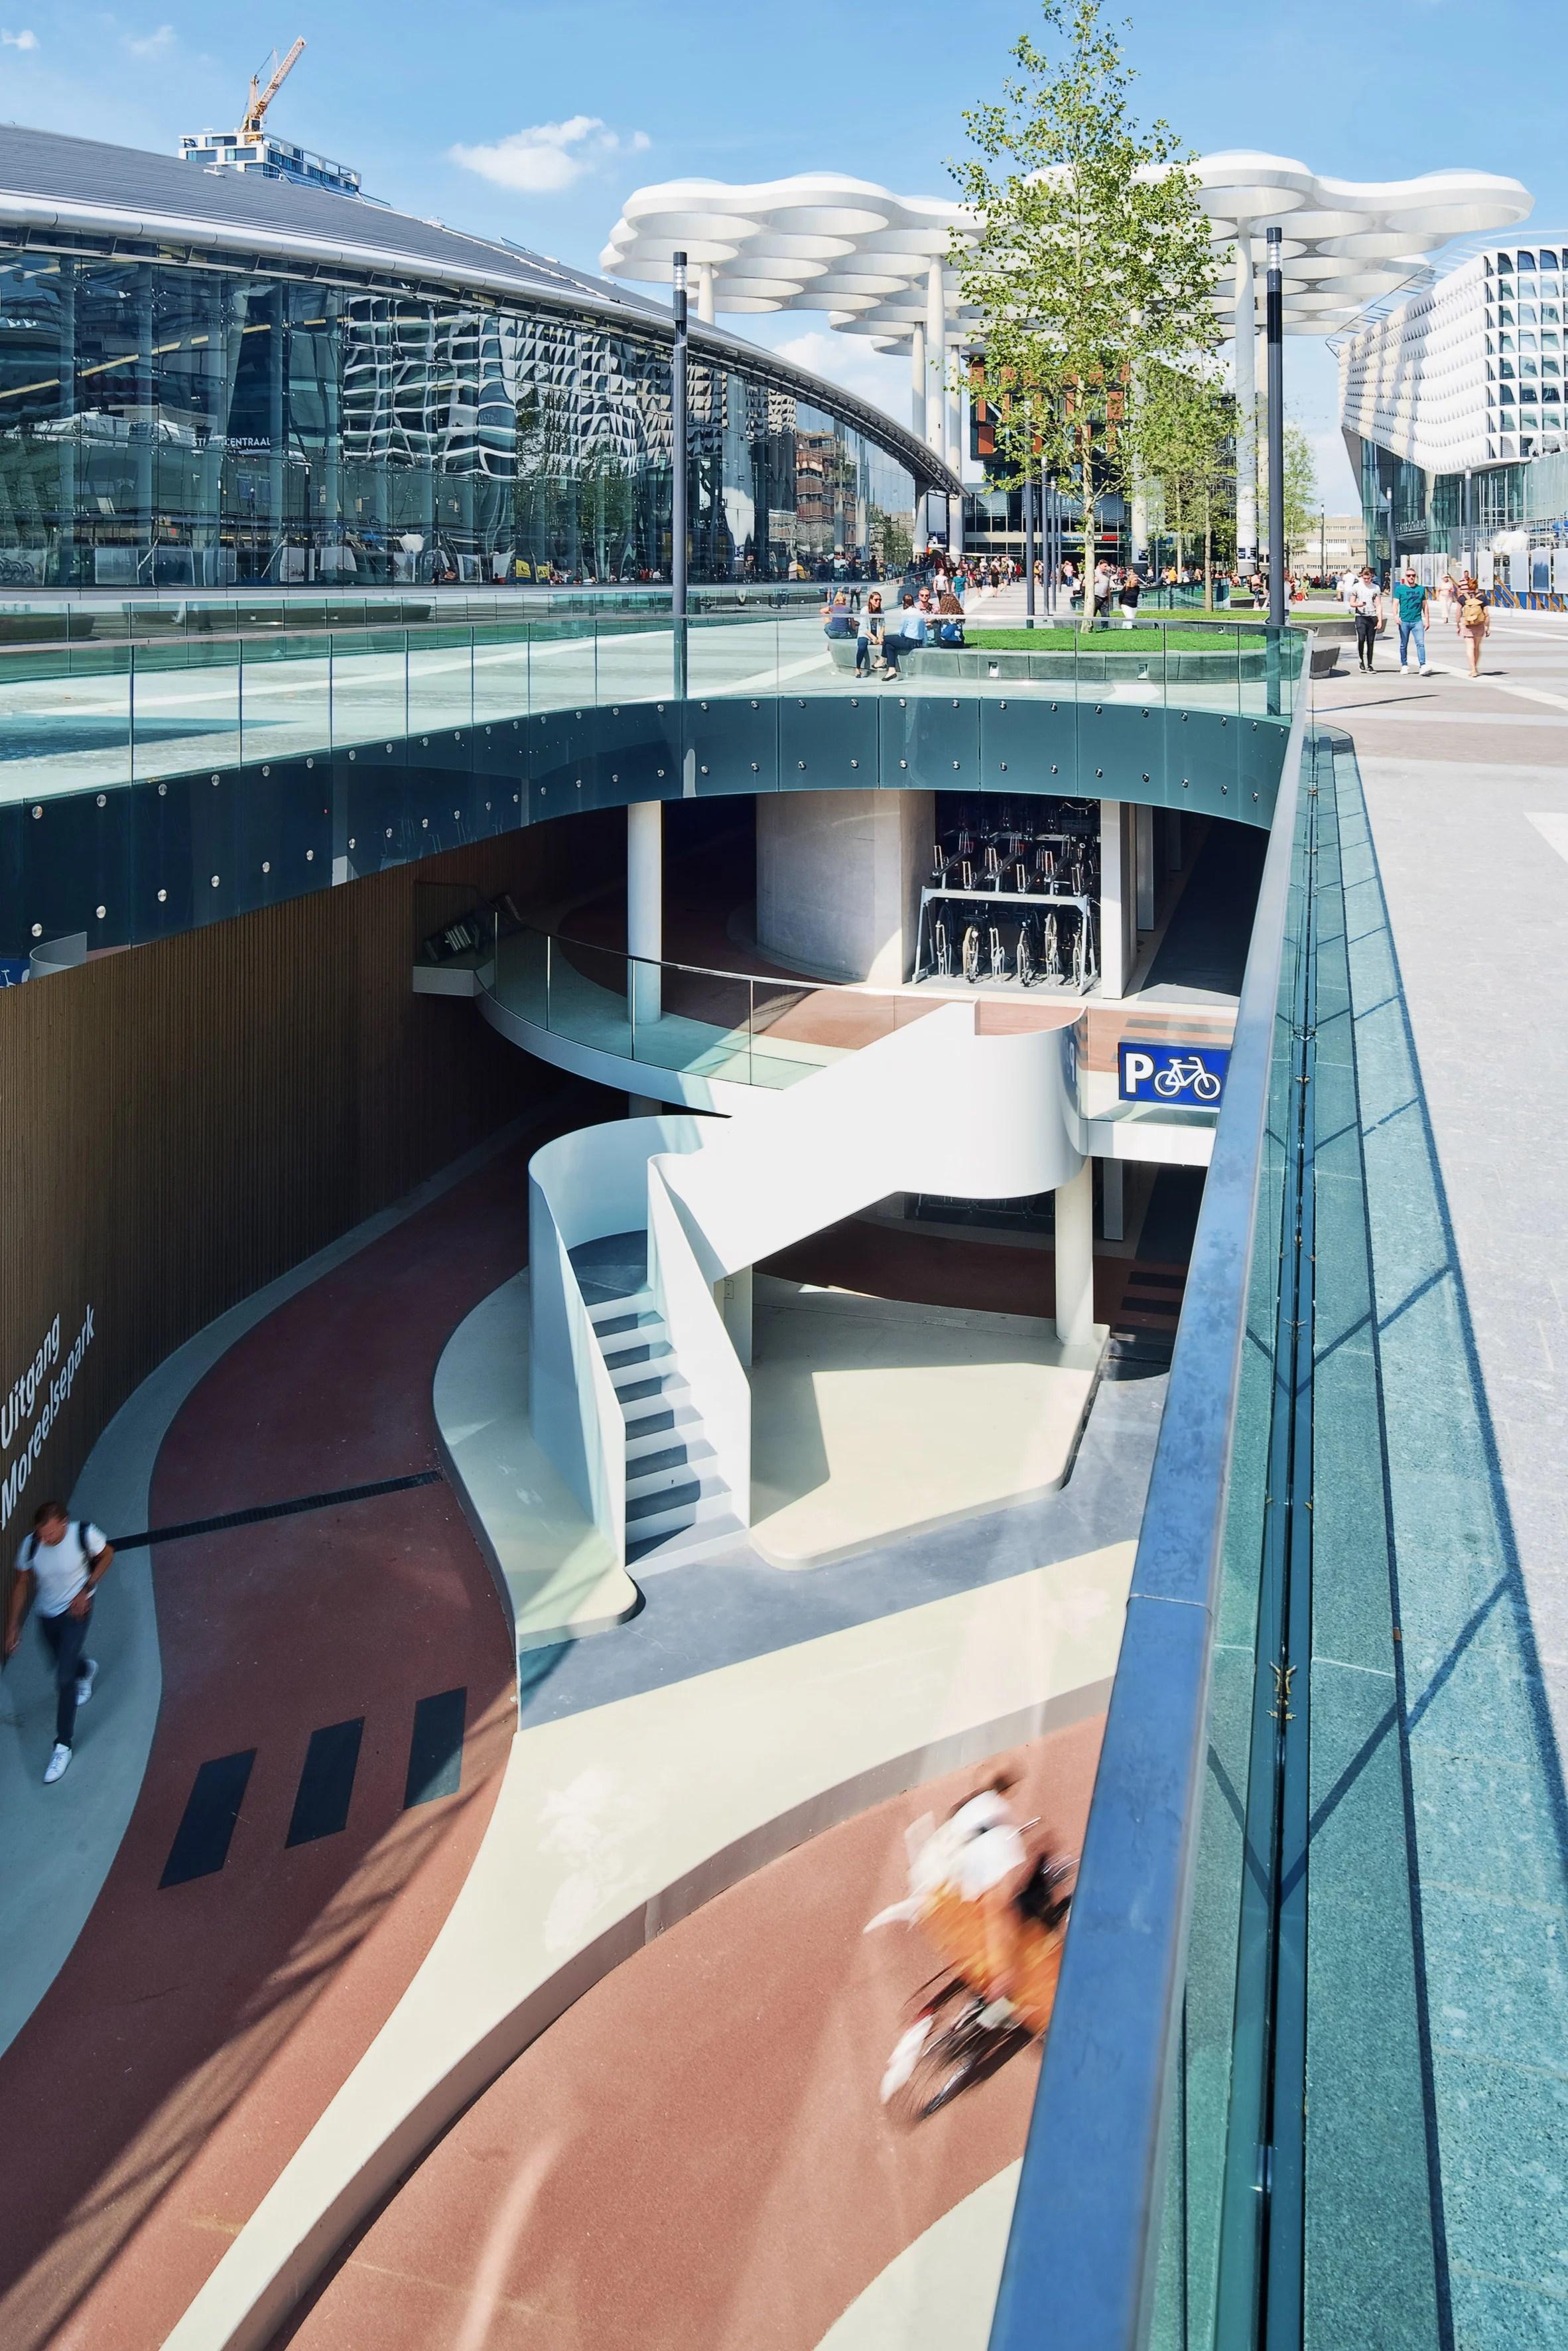 World's biggest bicycle park at Utrecht Centraal by Ector Hoogstad Architecten